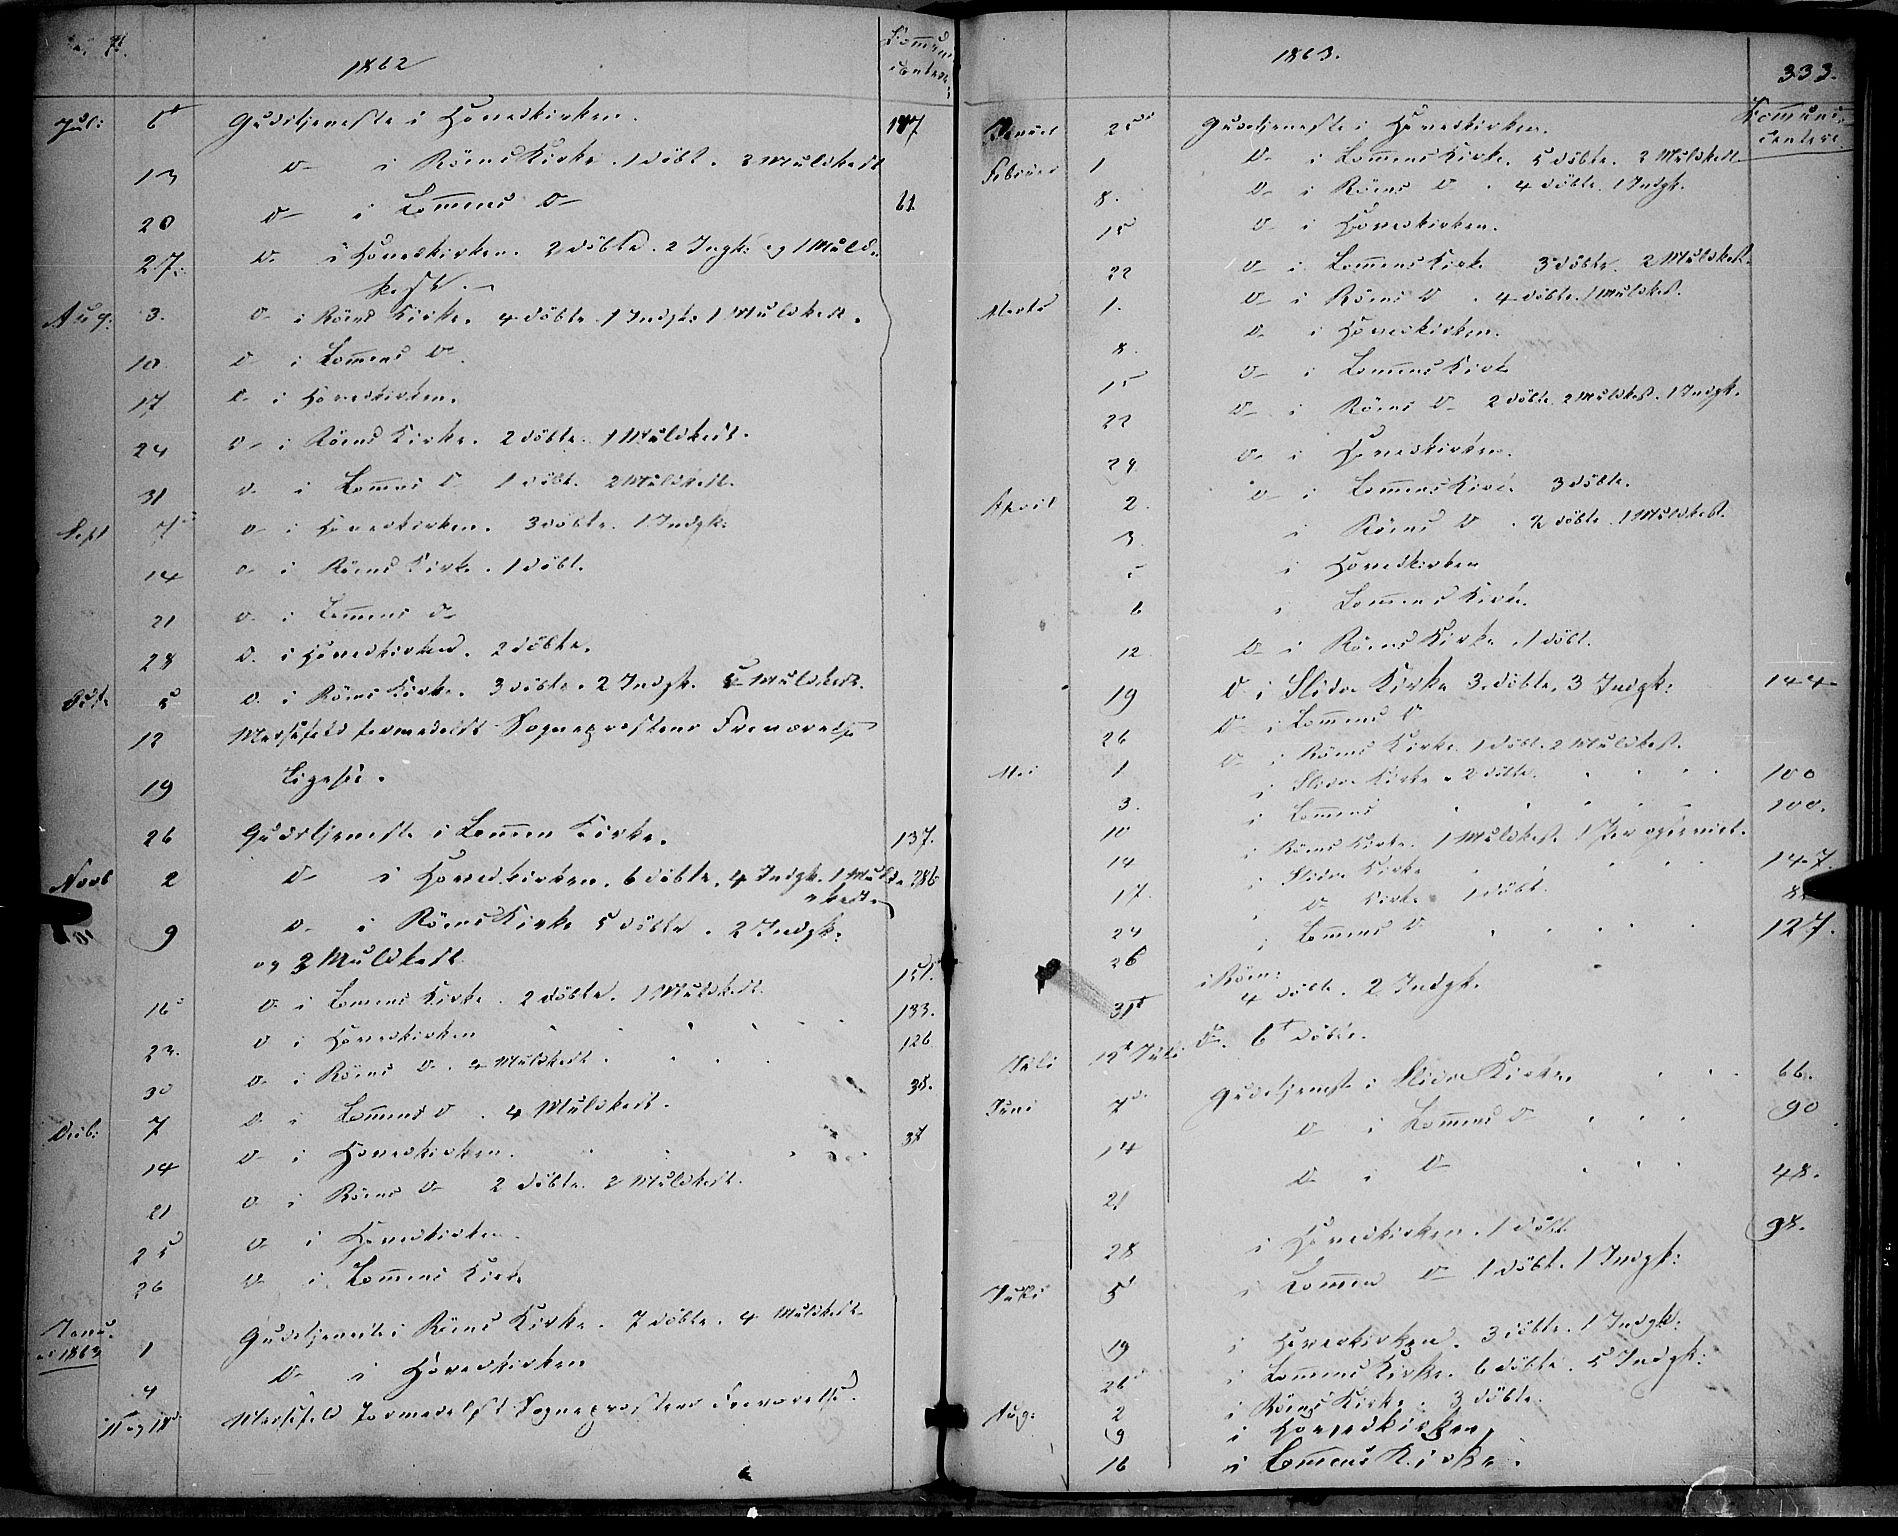 SAH, Vestre Slidre prestekontor, Ministerialbok nr. 2, 1856-1864, s. 333